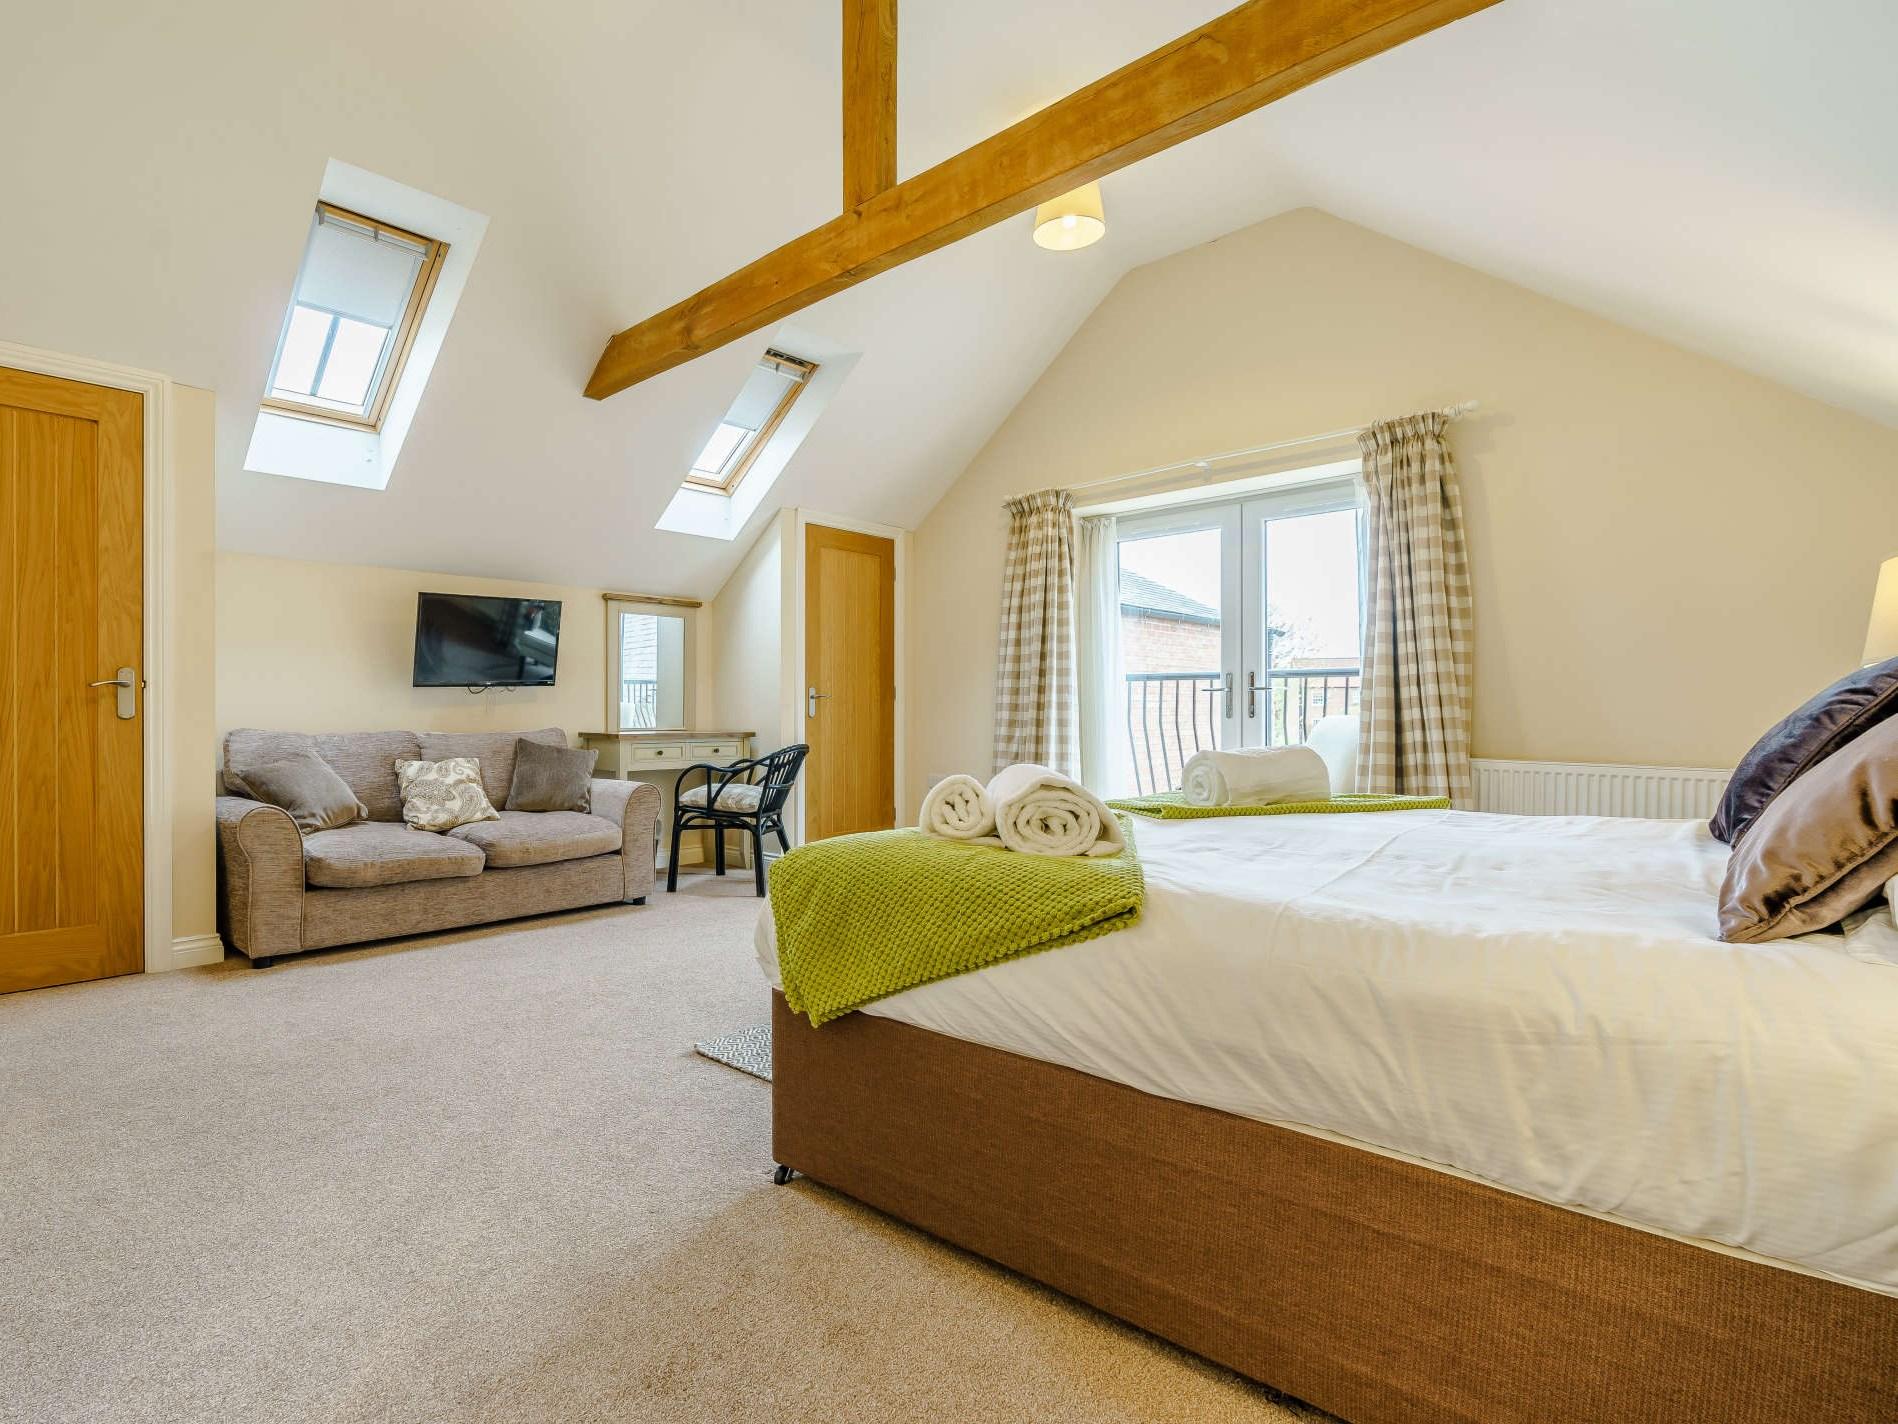 2 Bedroom Barn in North Yorkshire, Yorkshire Dales